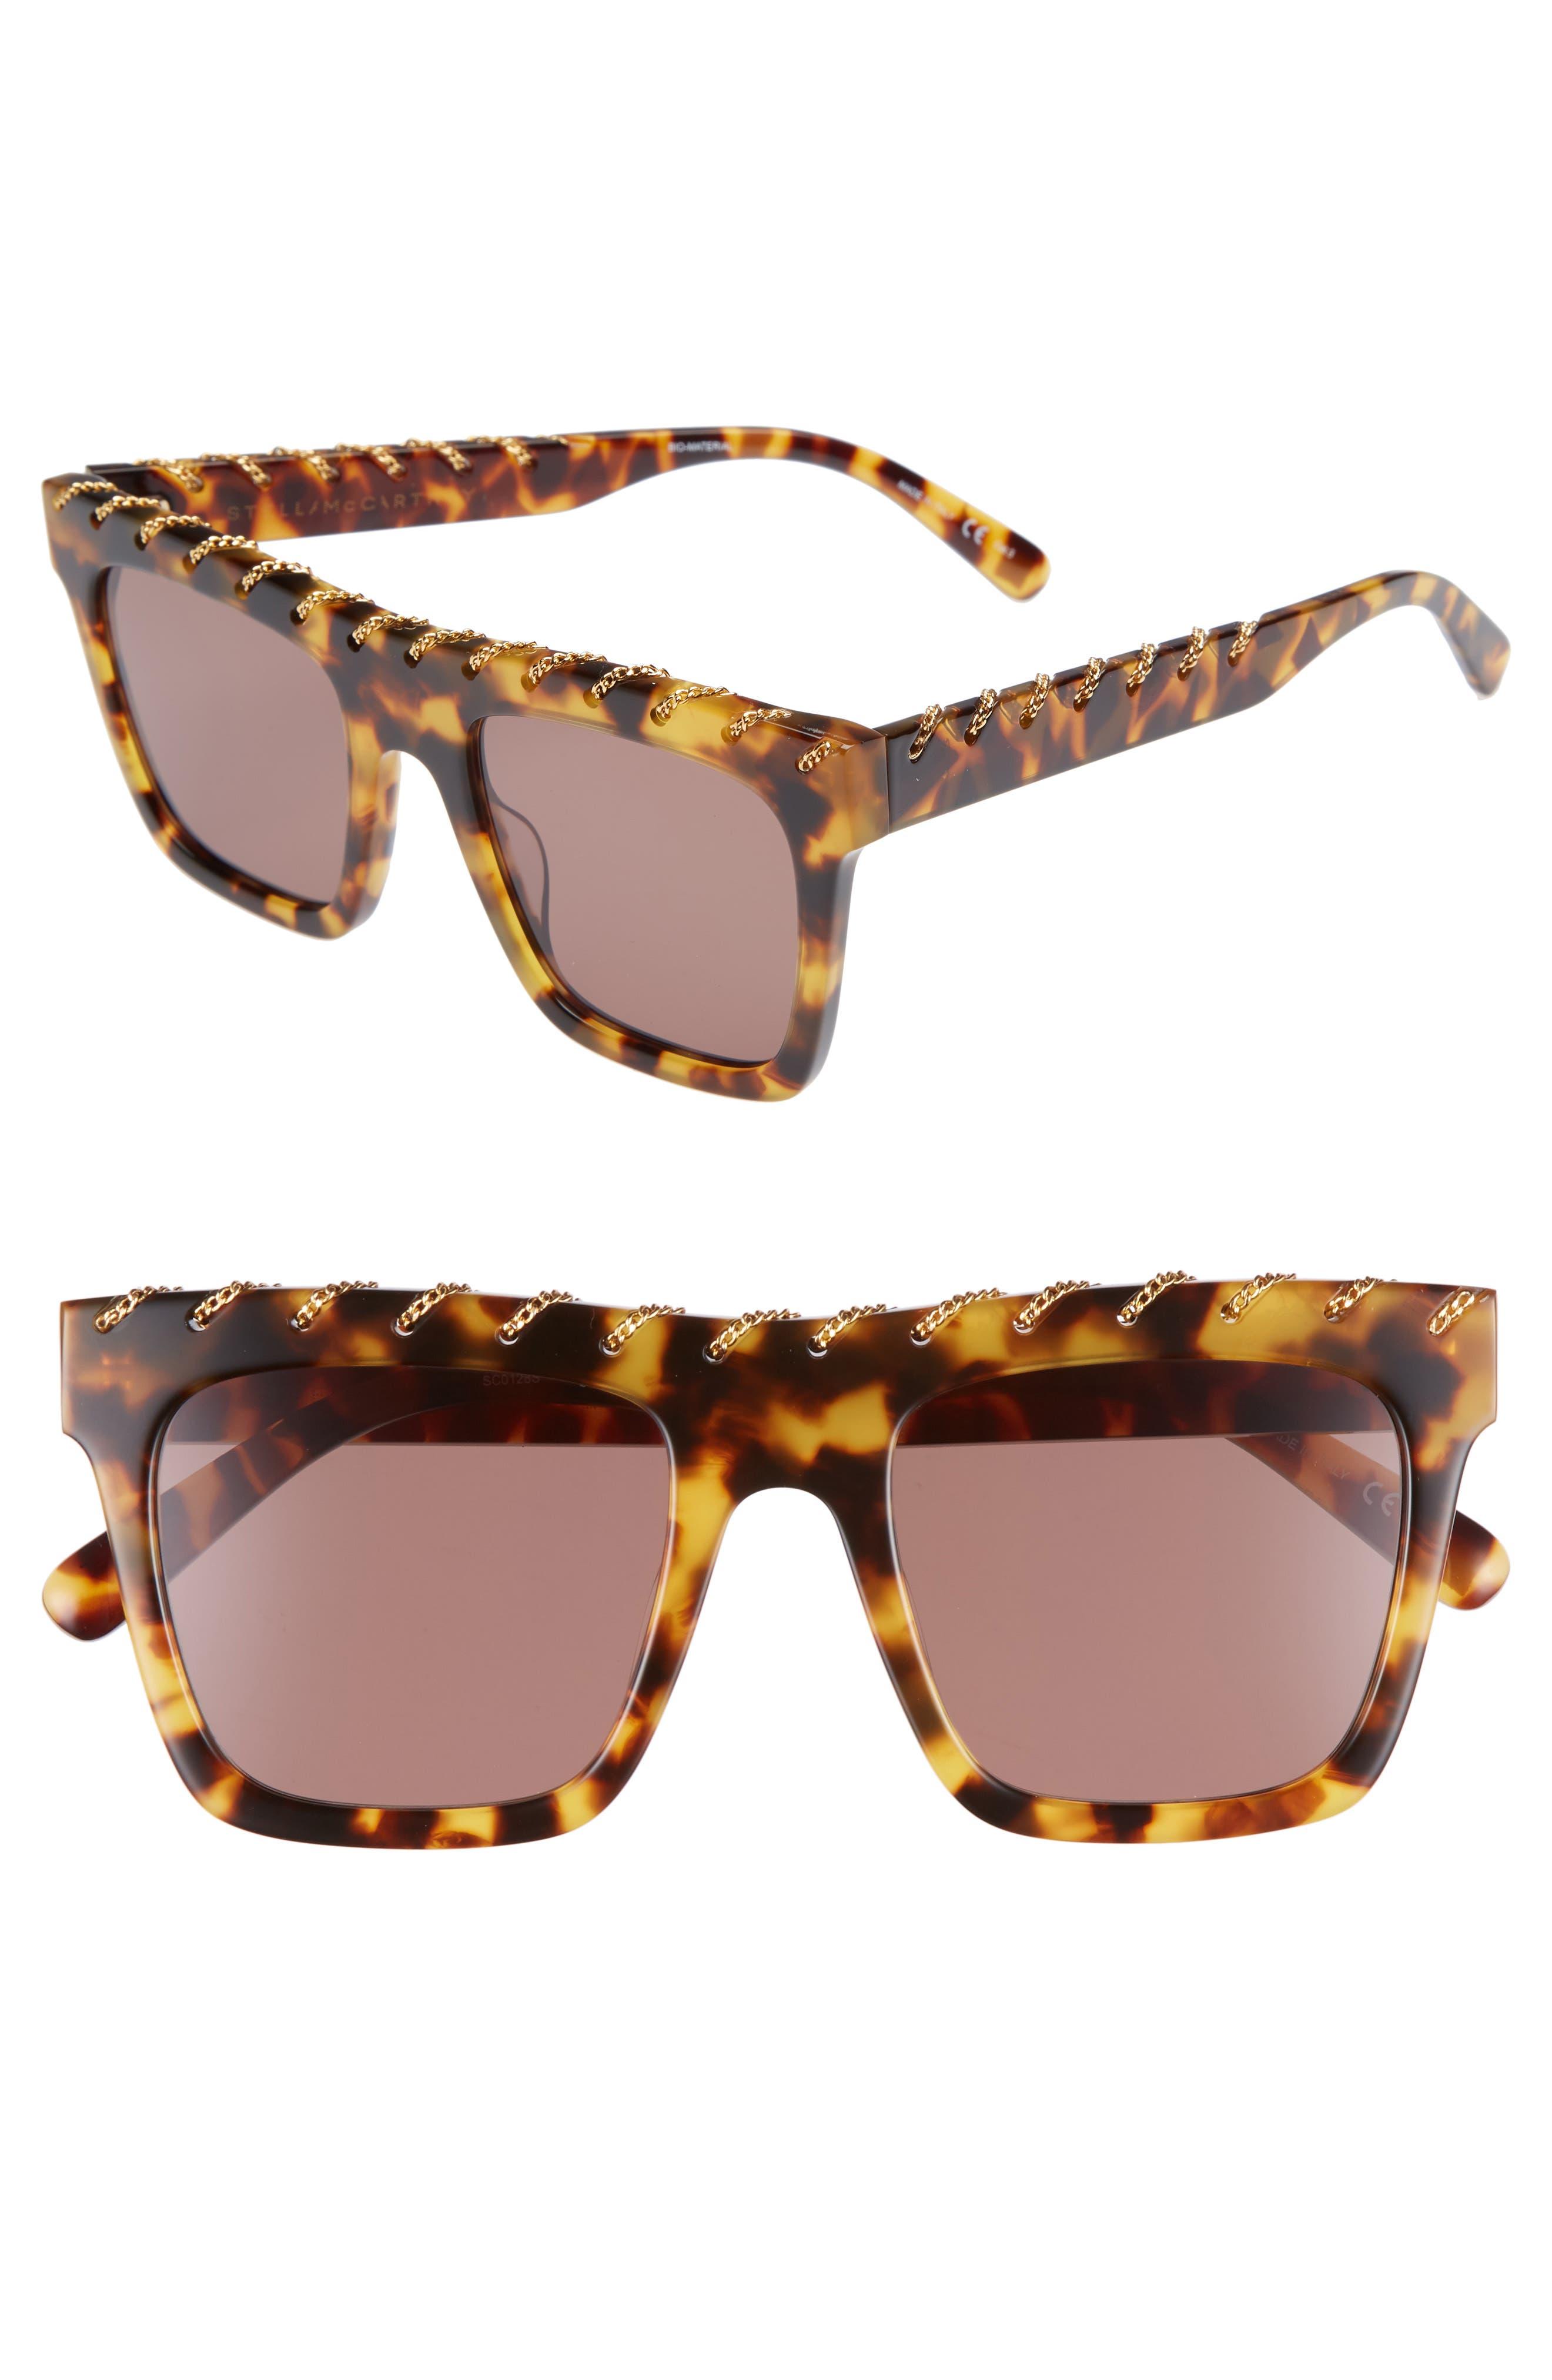 51mm Chain Detail Square Sunglasses,                             Main thumbnail 1, color,                             Medium Havana/ Gold